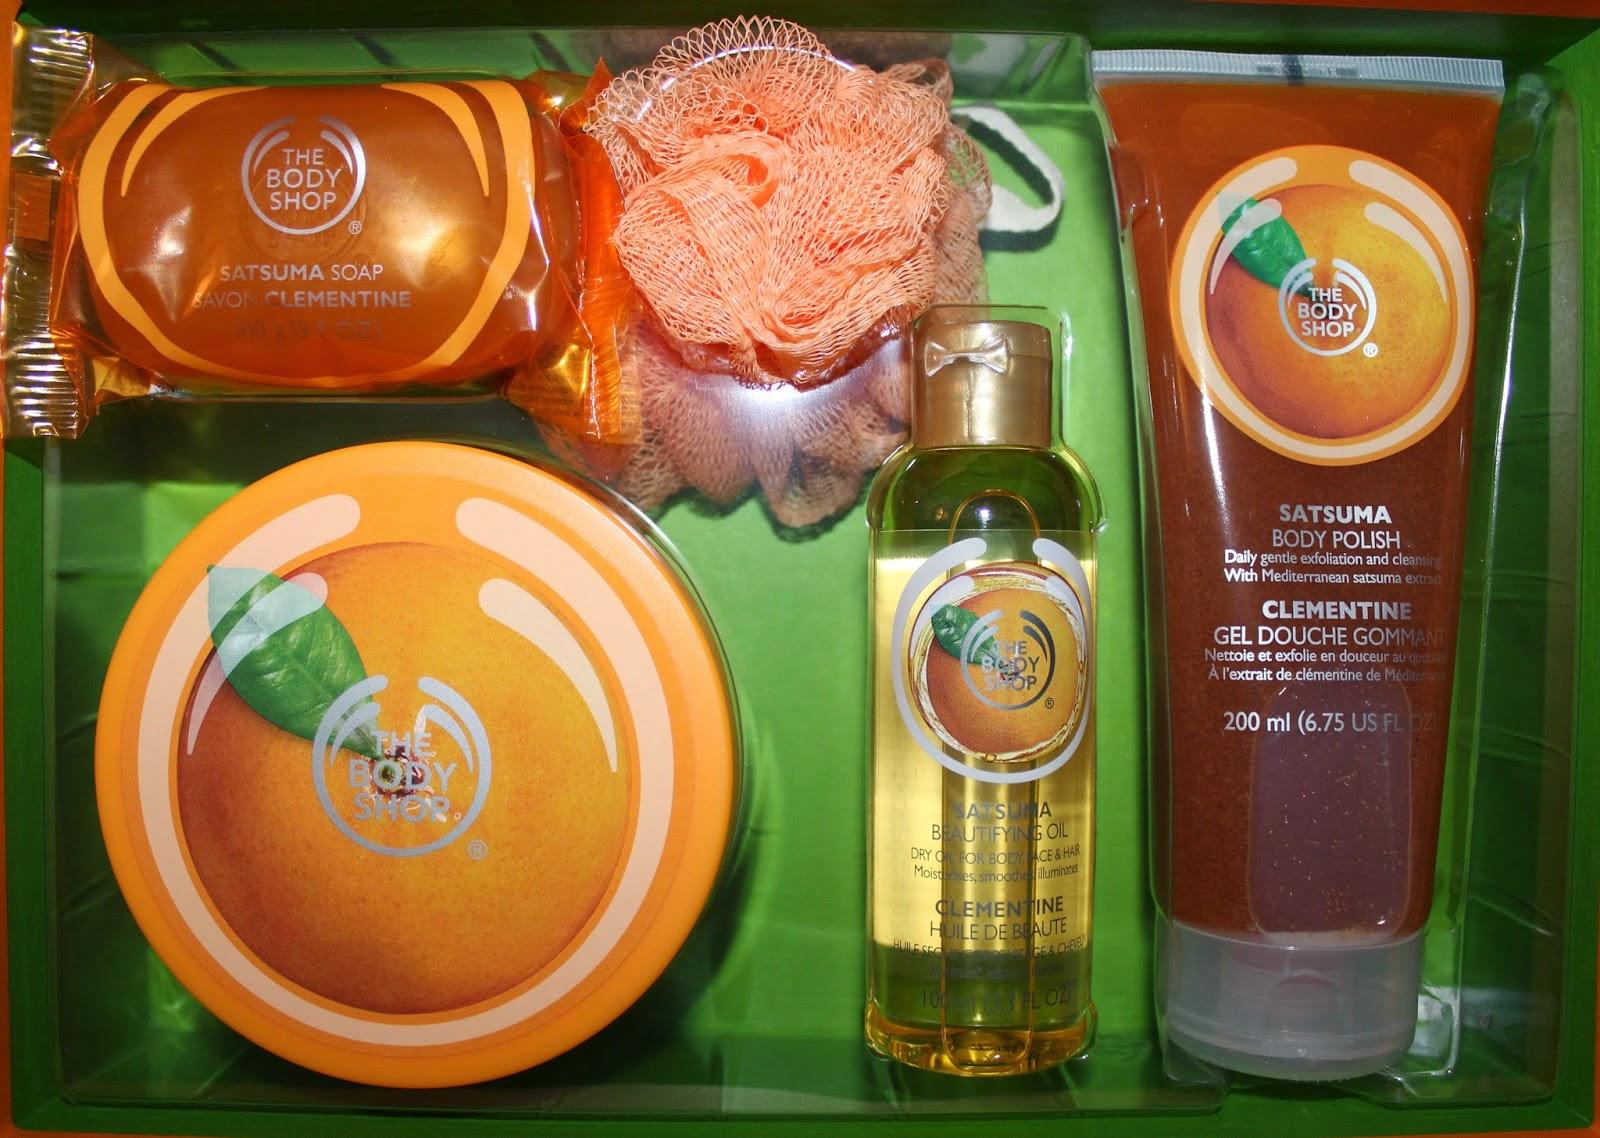 The Body Shop's Sastuma Premium Selection